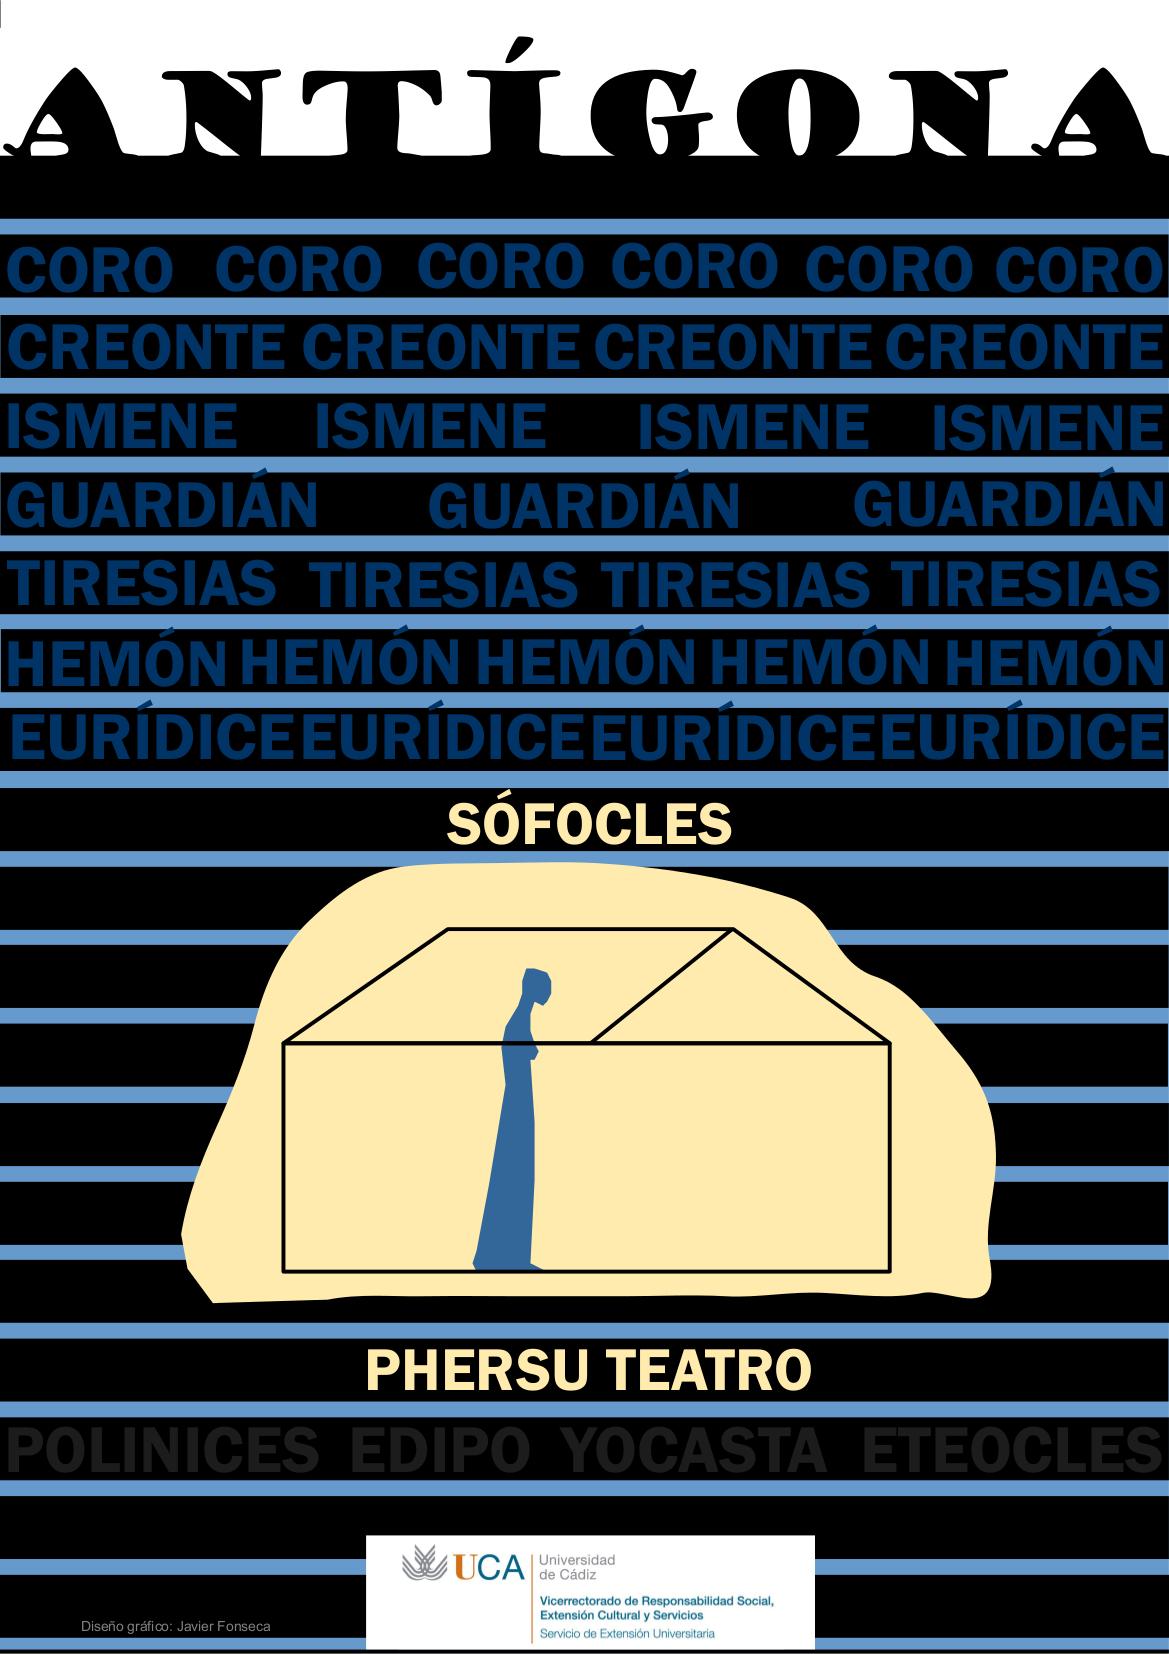 Imagen teatro 'Antígona'